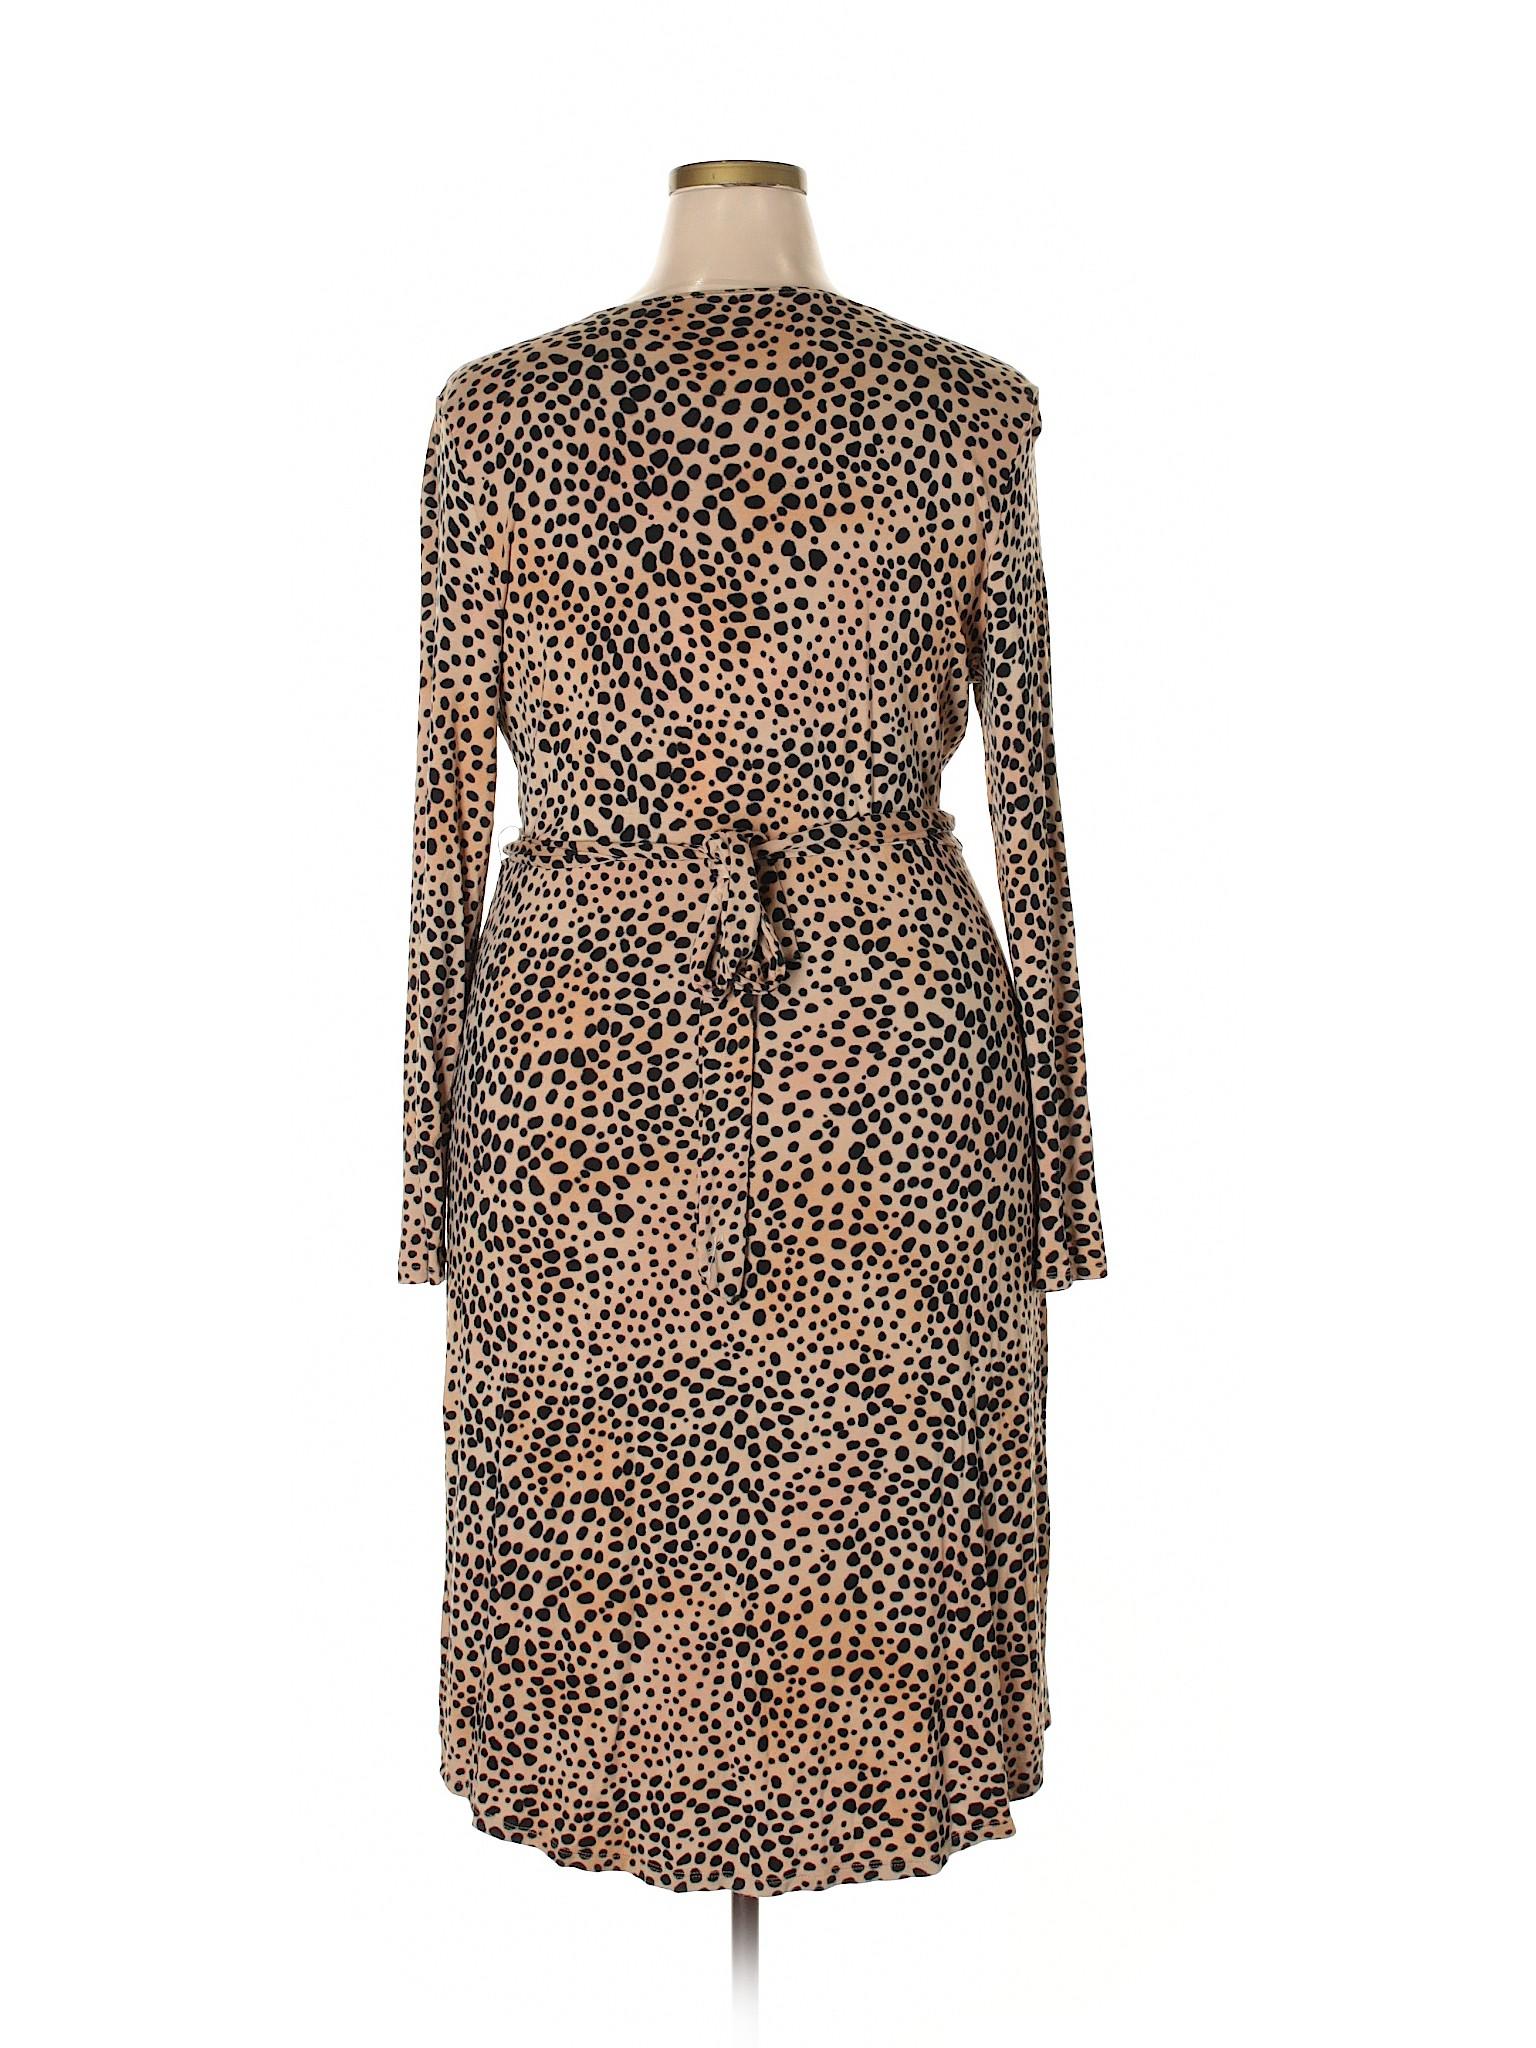 Winter Ava Viv Dress Casual Boutique amp; Bz1Tazq